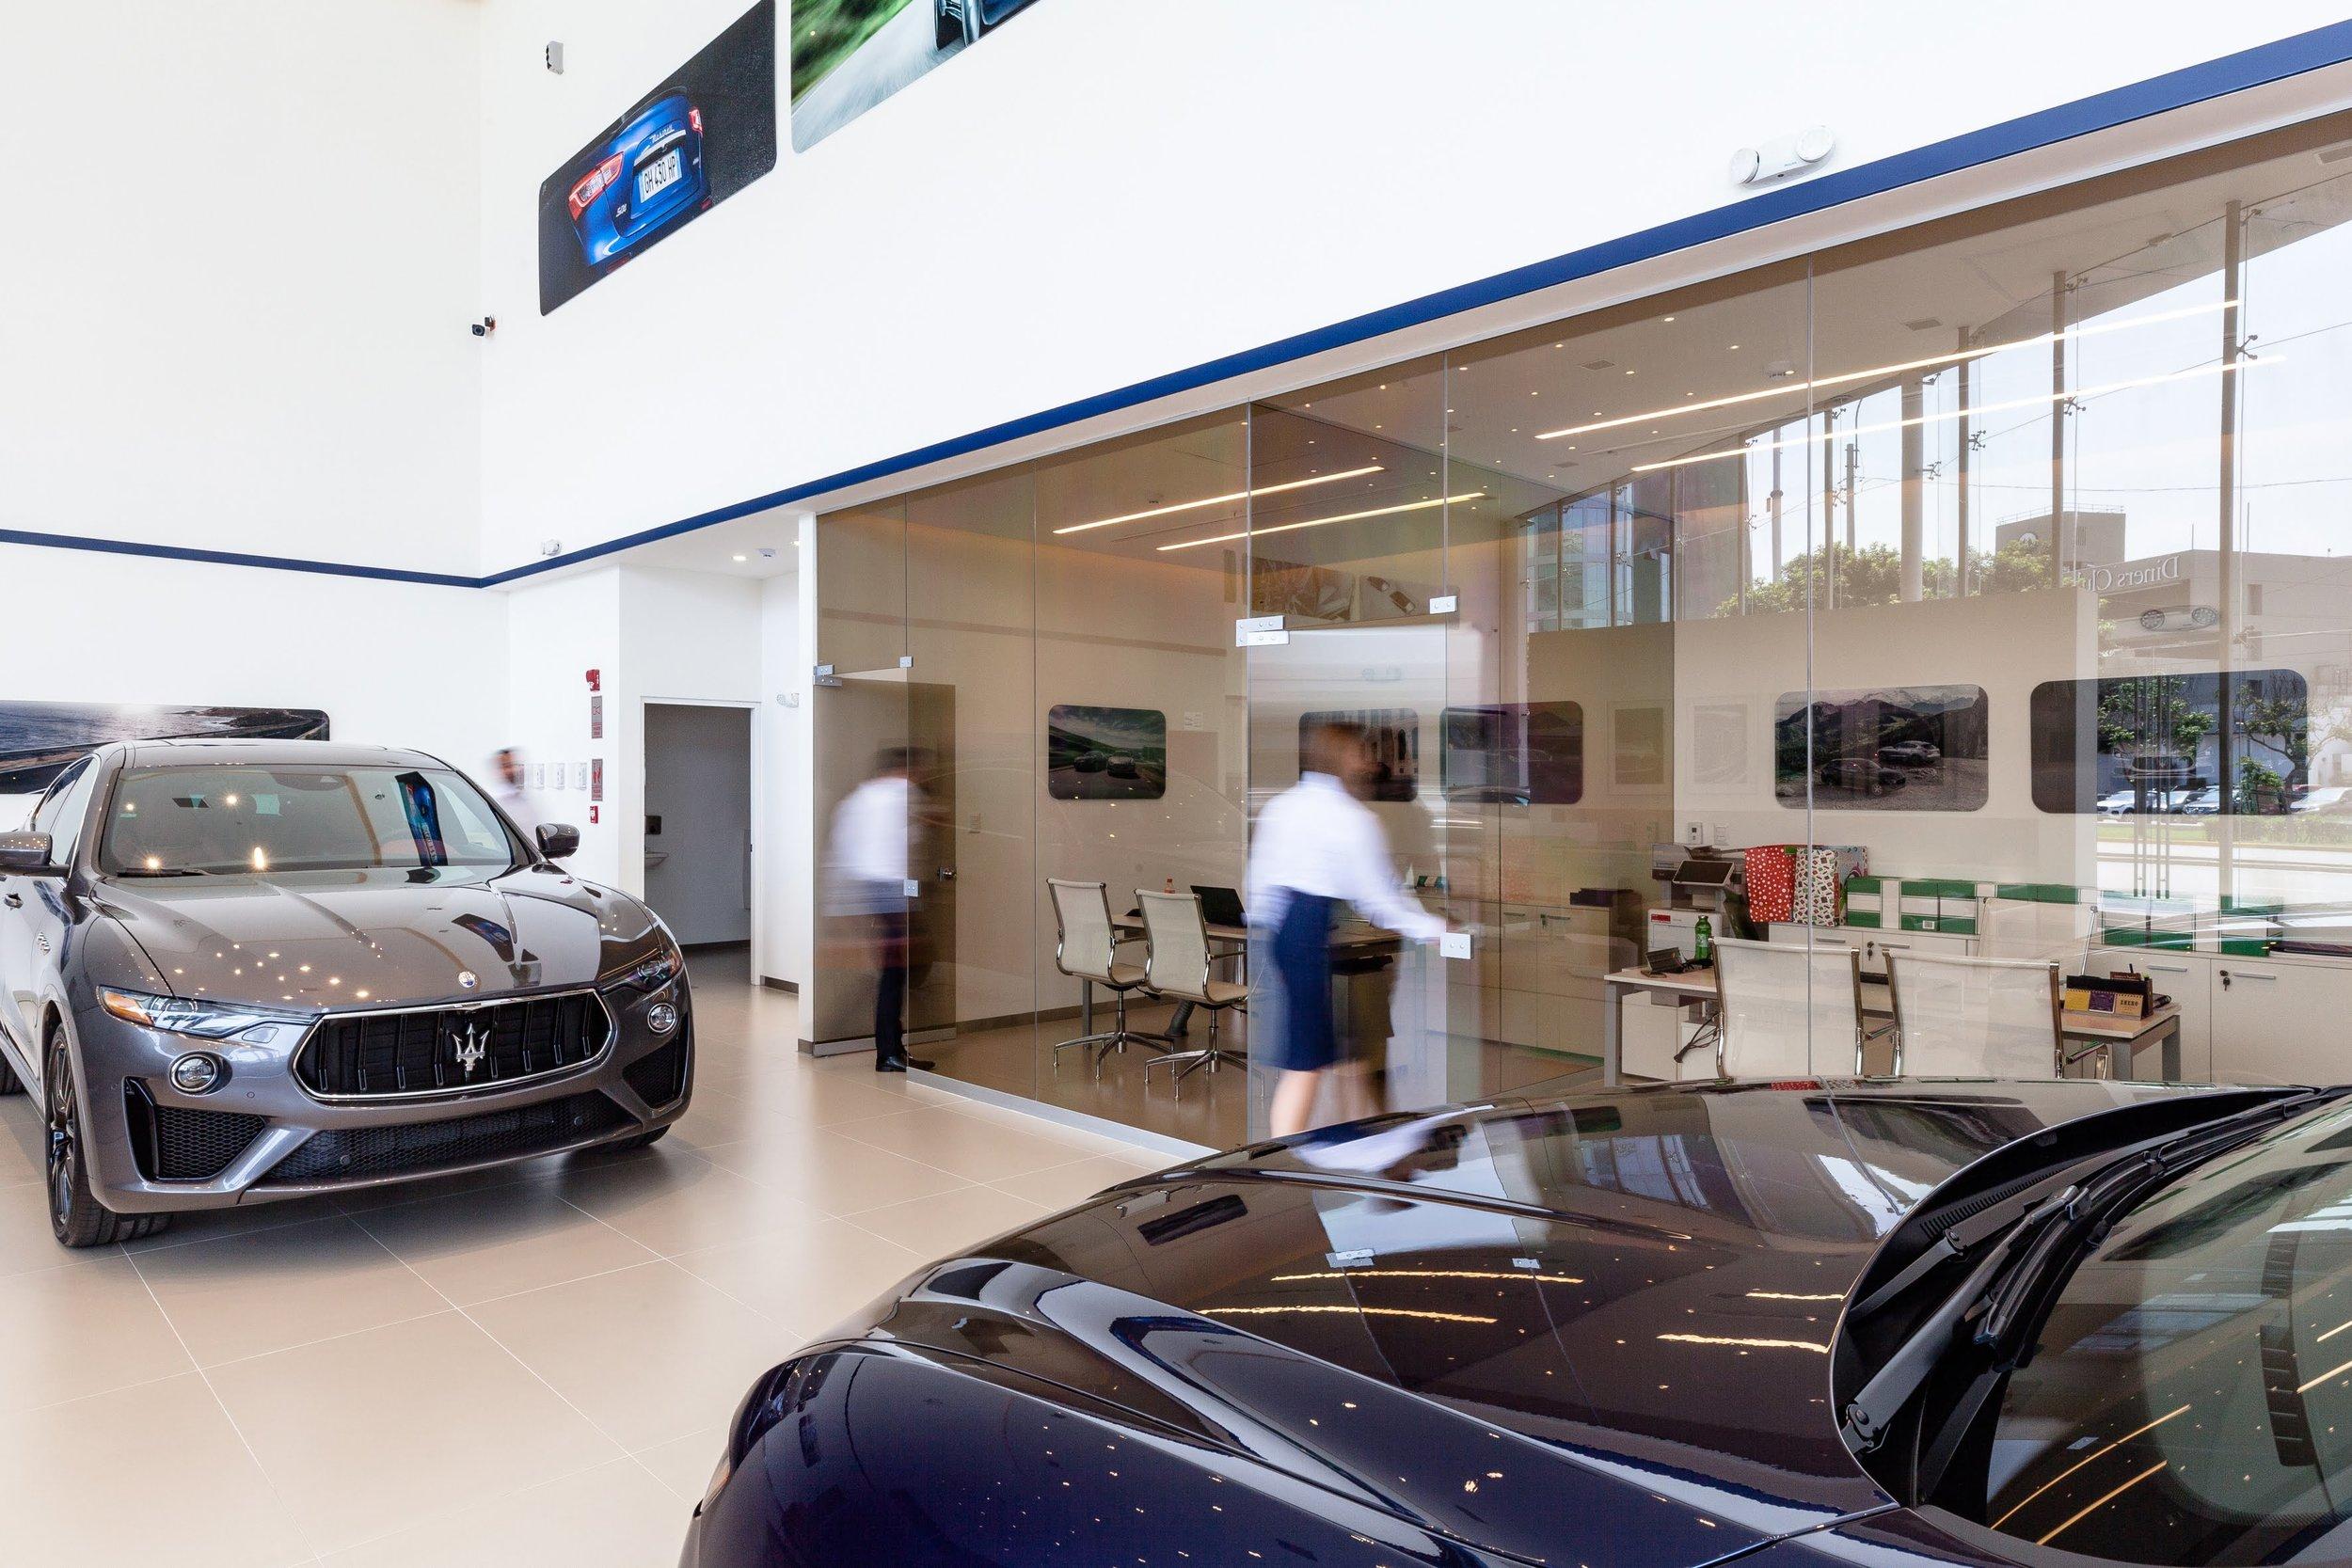 20181219-DRRP-PE-Fotos-Maserati-035.jpg